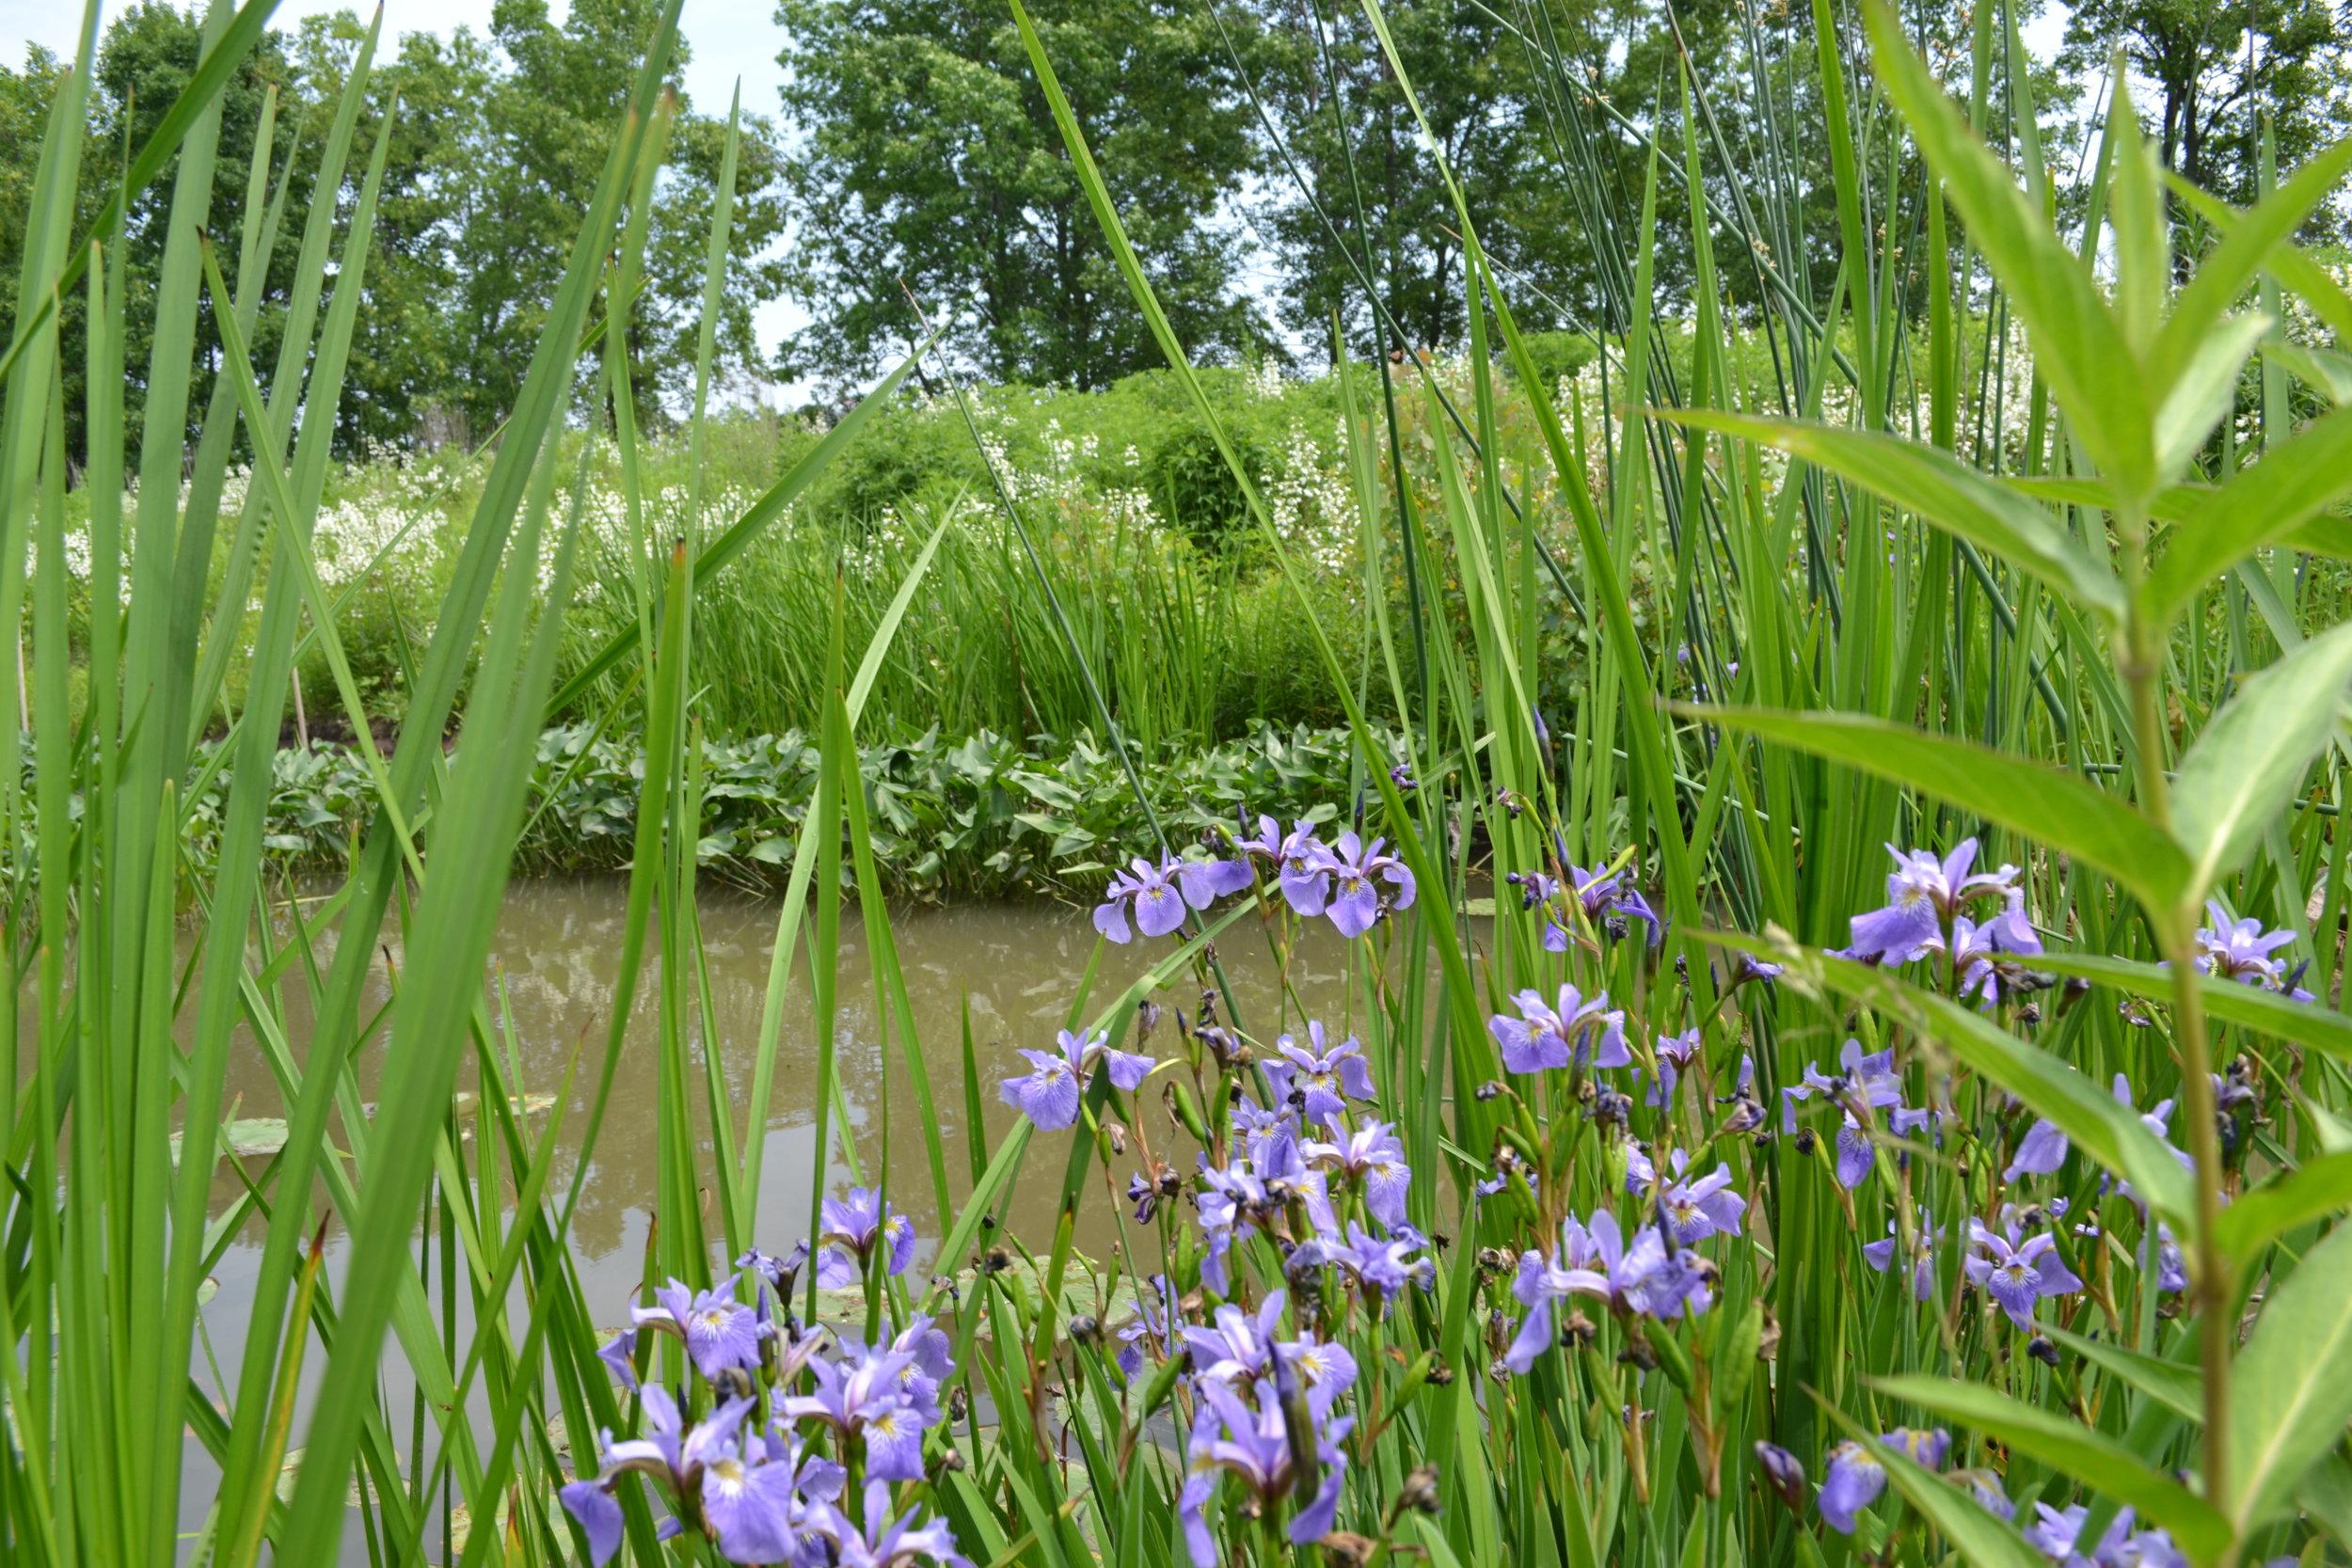 Wetland Edge Vegetation